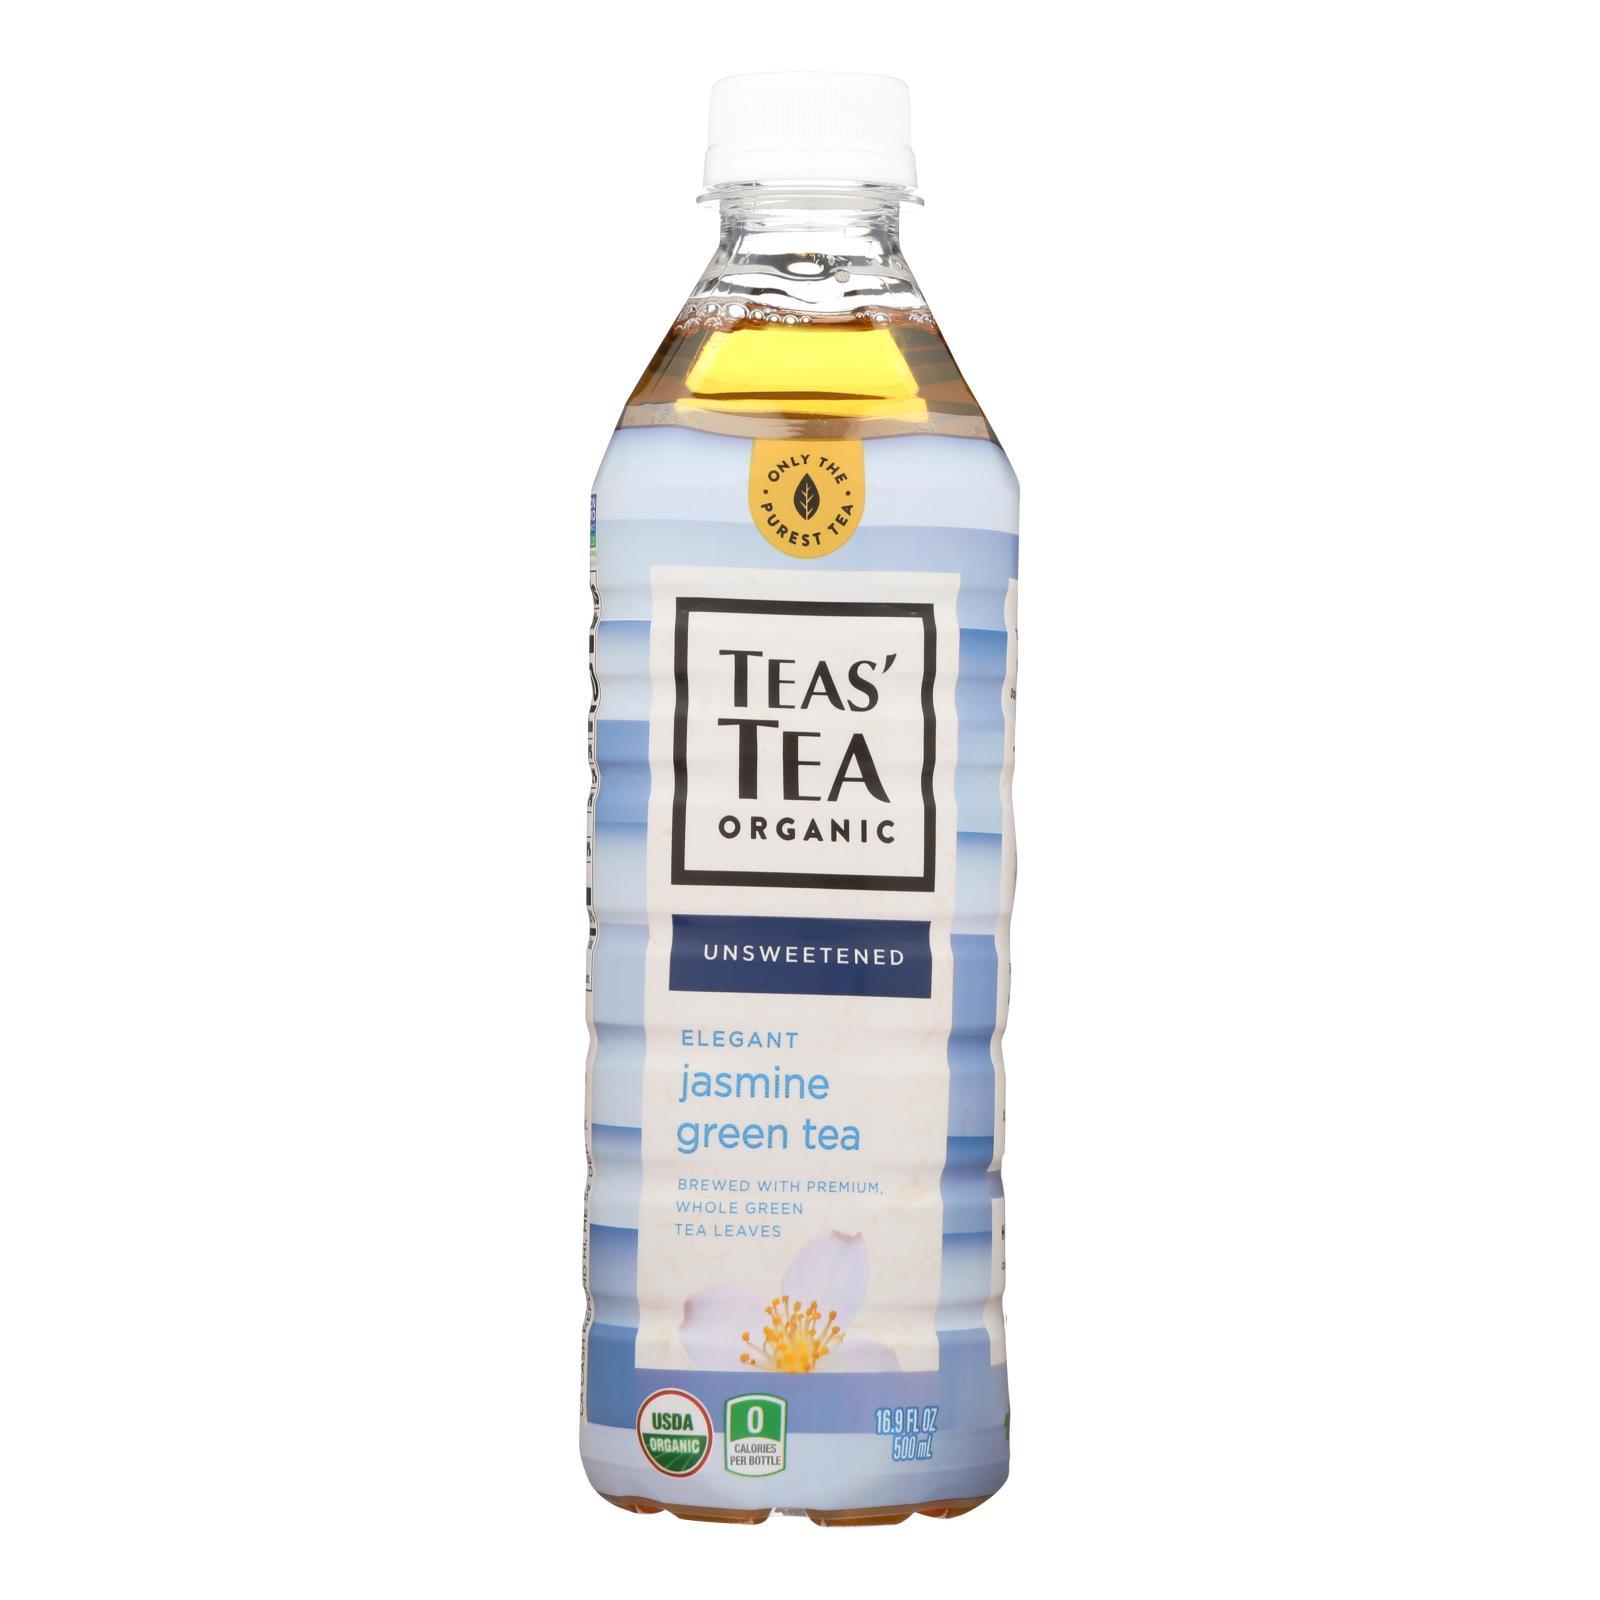 Itoen Tea - Organic - Jasmine - Green - Bottle - Case of 12 - 16.9 fl oz